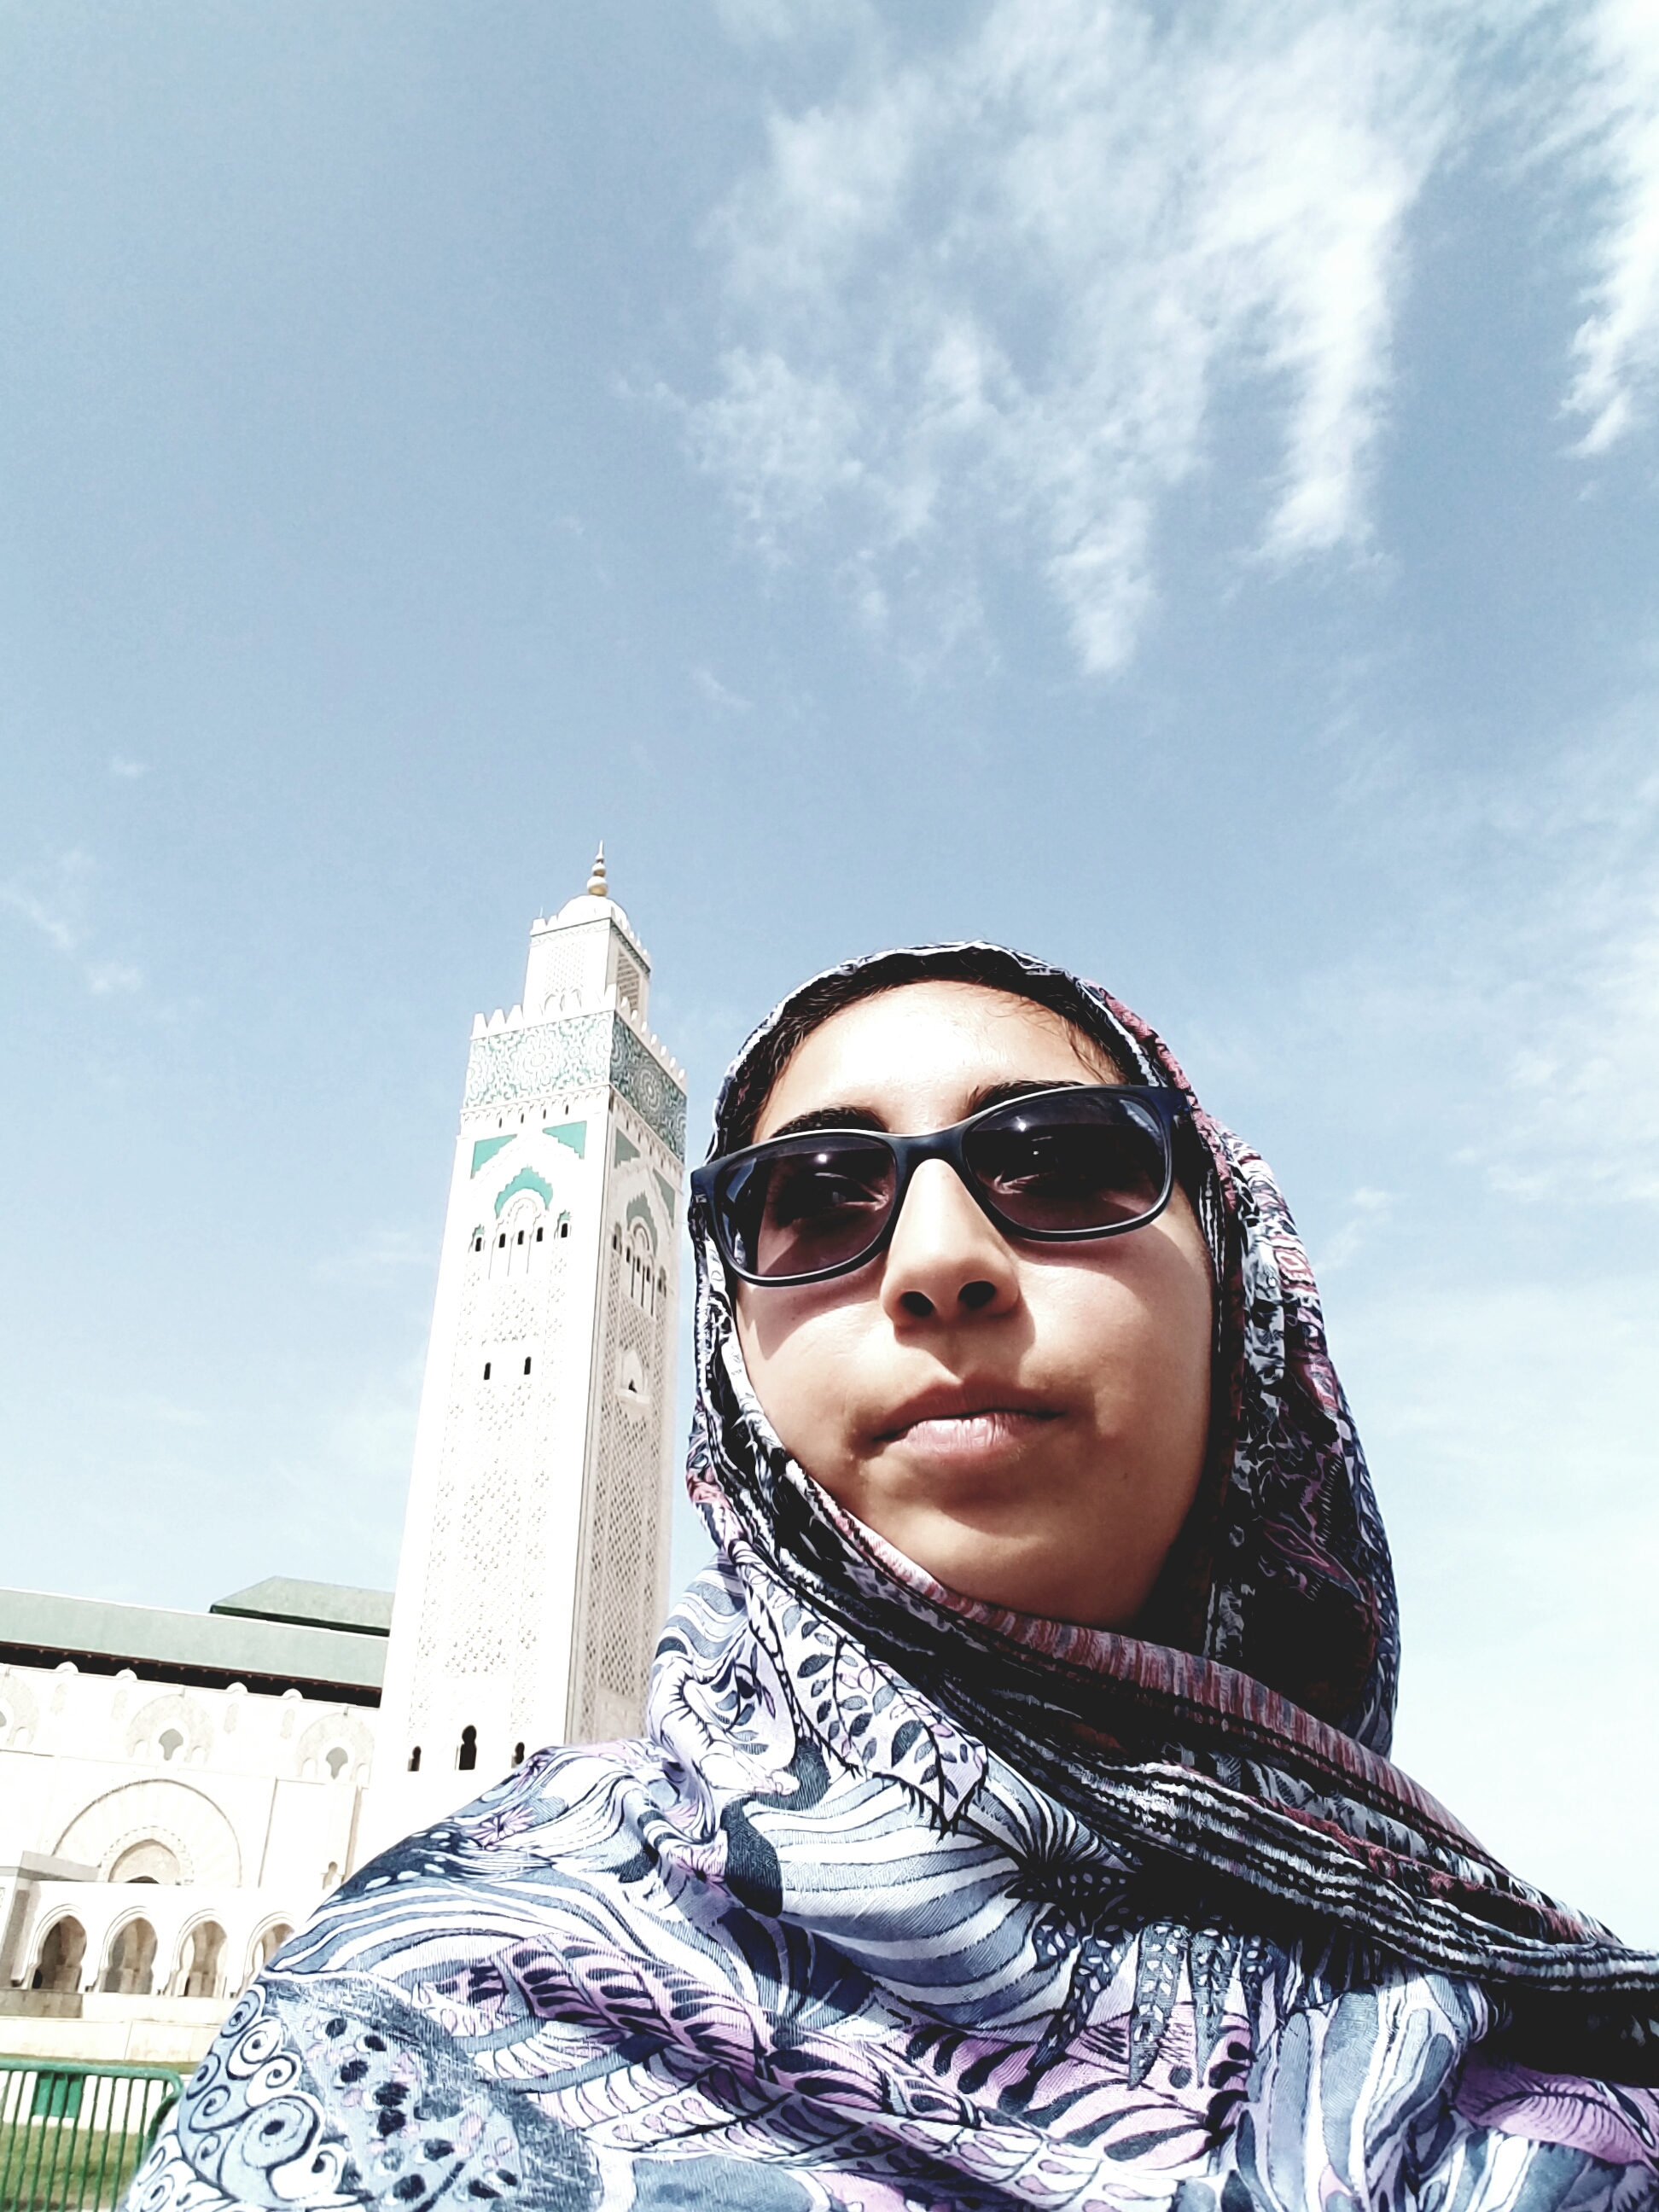 Yesenia Velasquez in Morocco